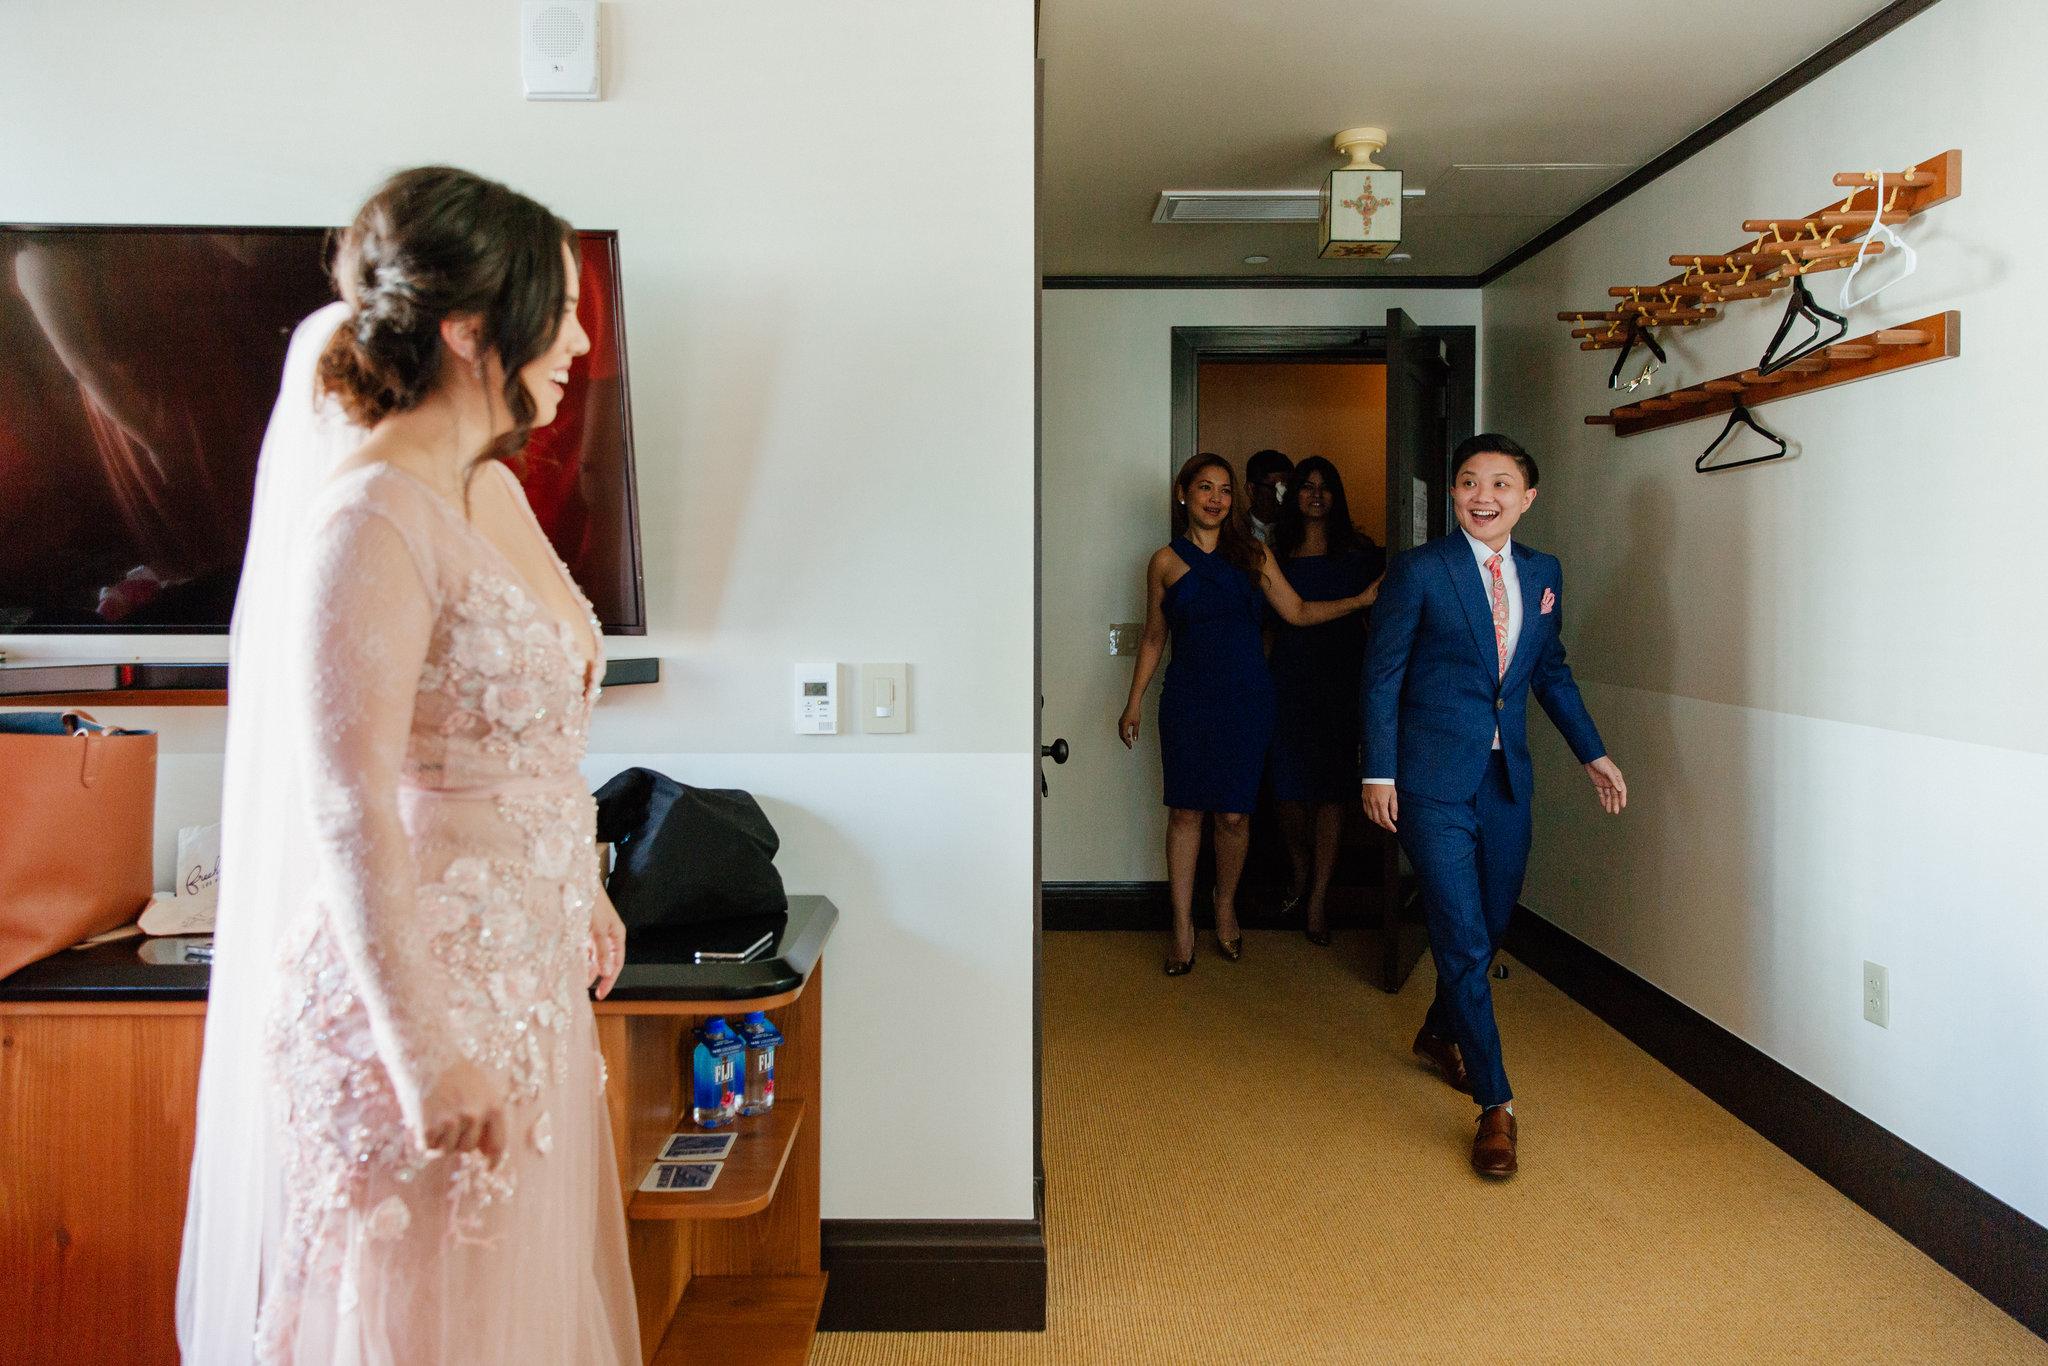 millwick-wedding-marble-rye-photography-030118-gettingready-076.jpg